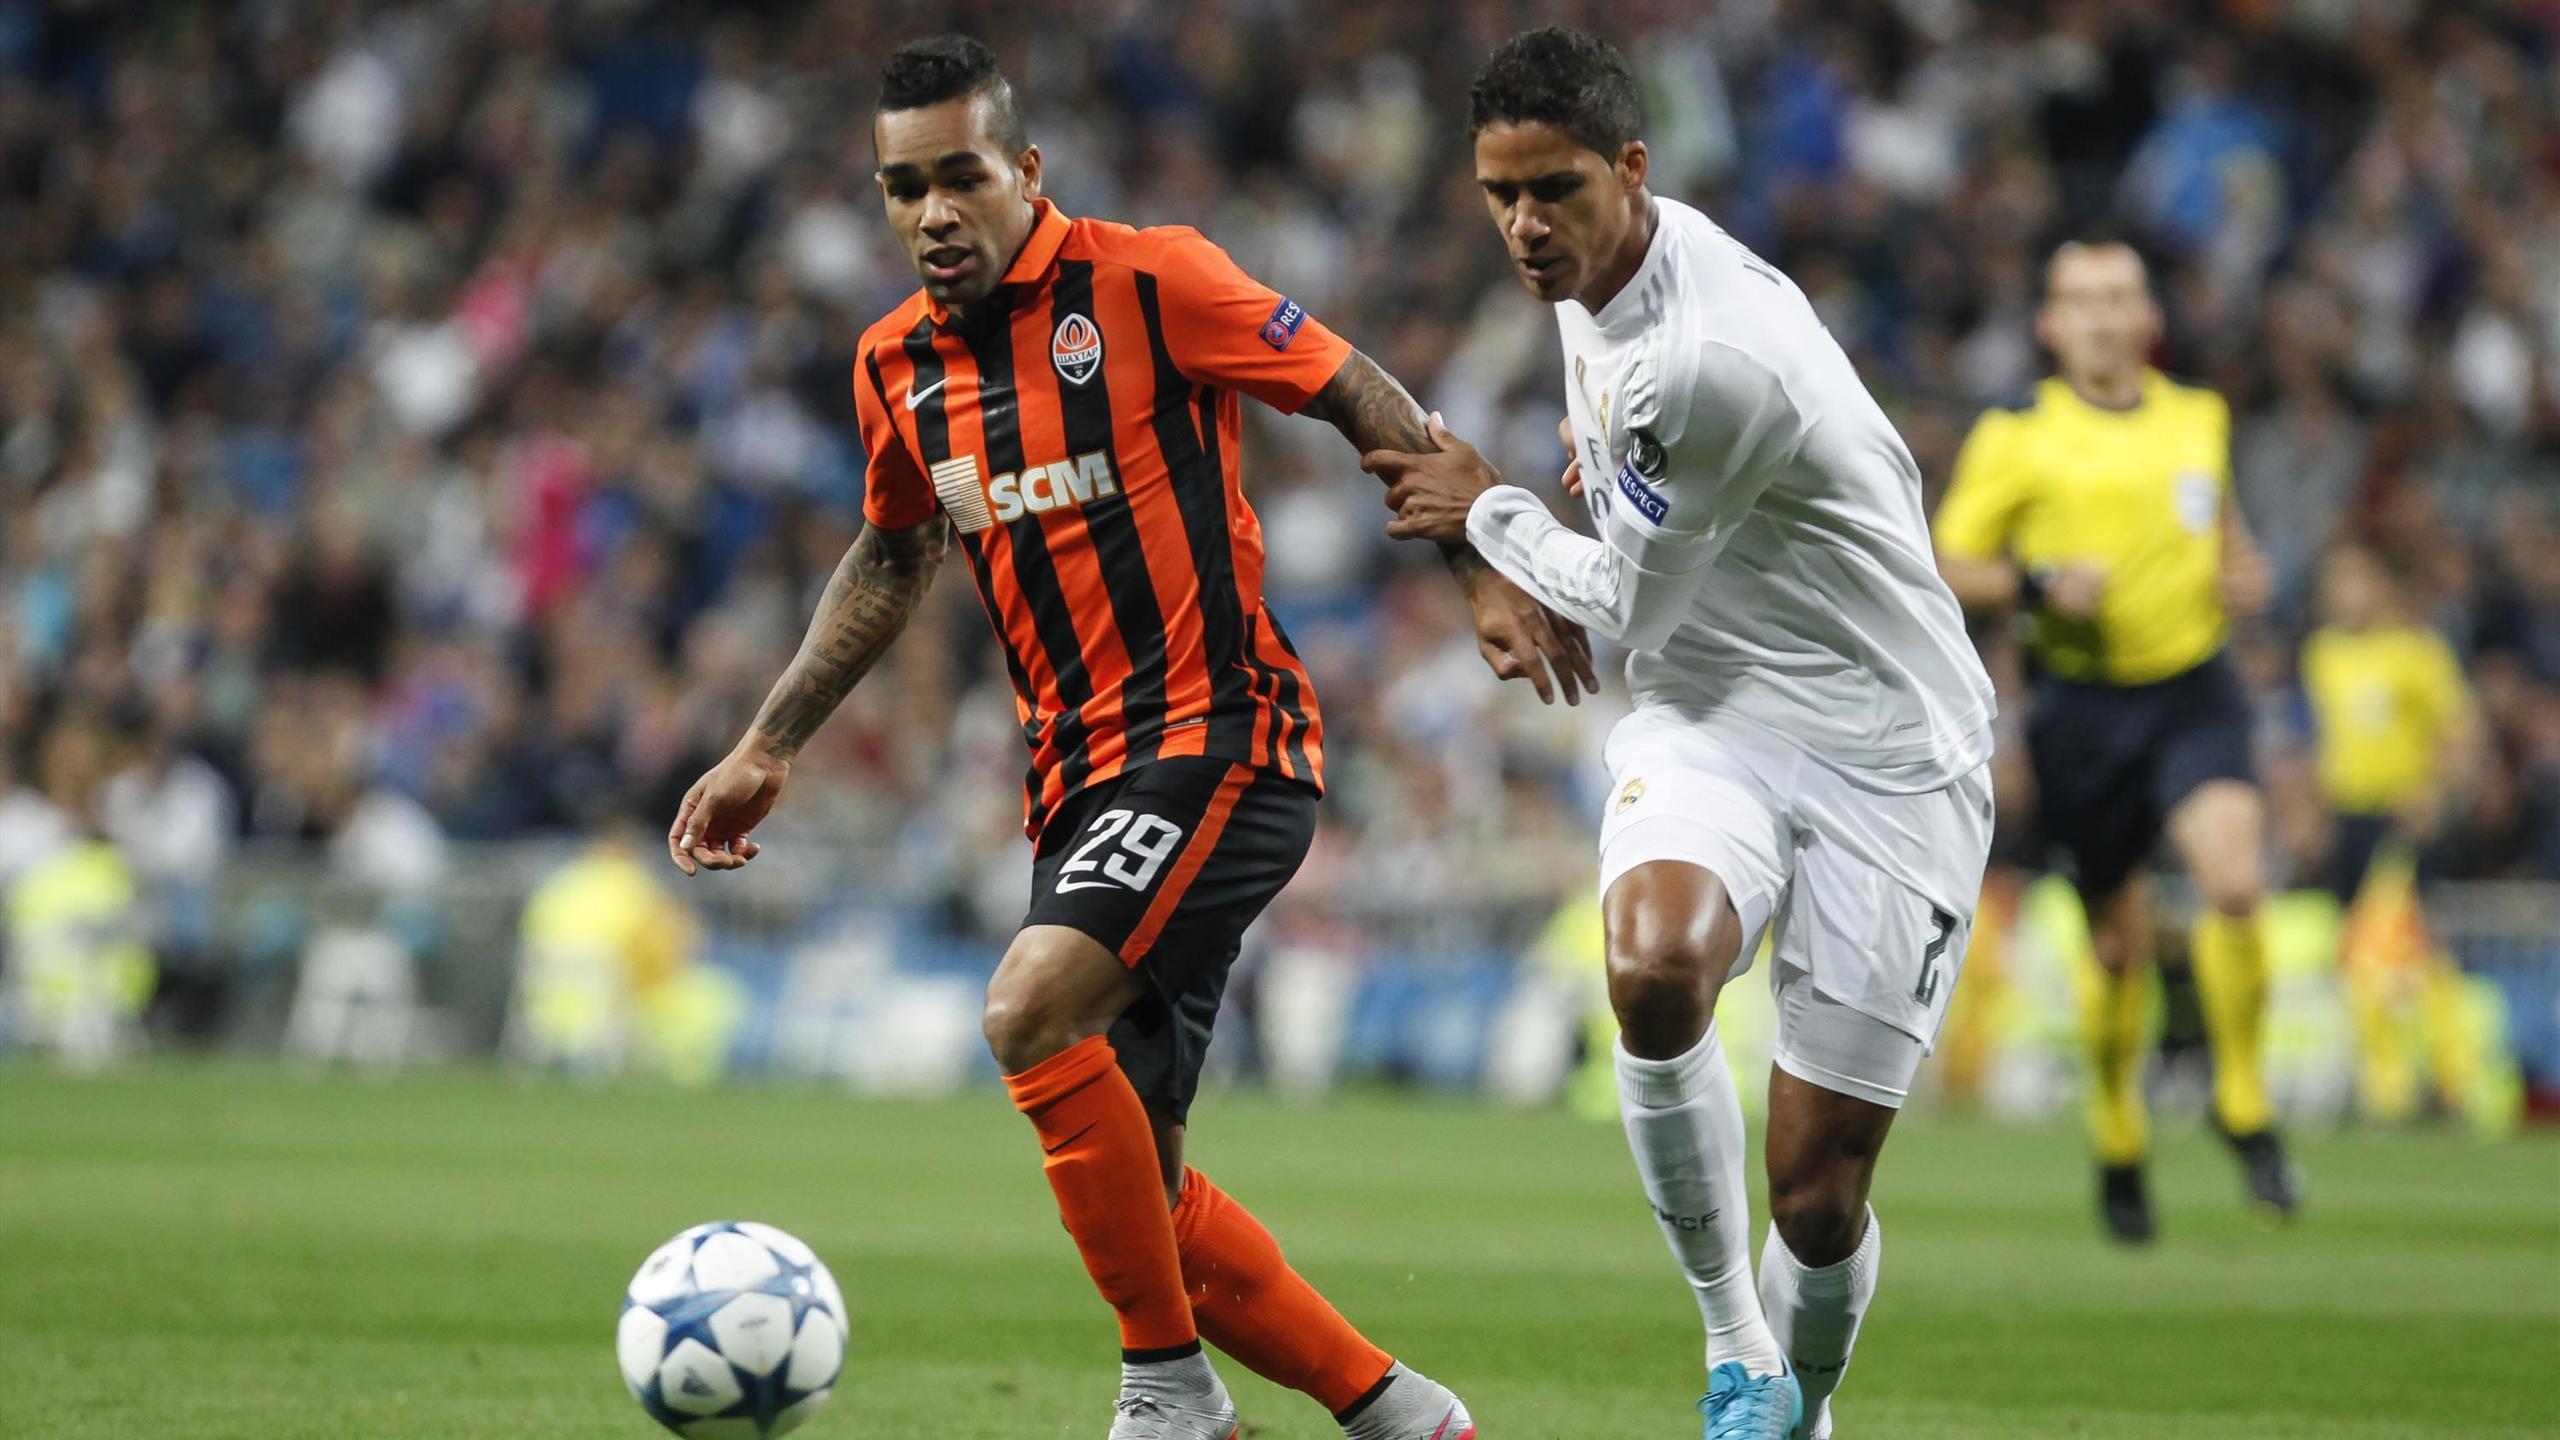 Alex Teixeira face à Raphaël Varane lors de Shakhtar-Real Madrid